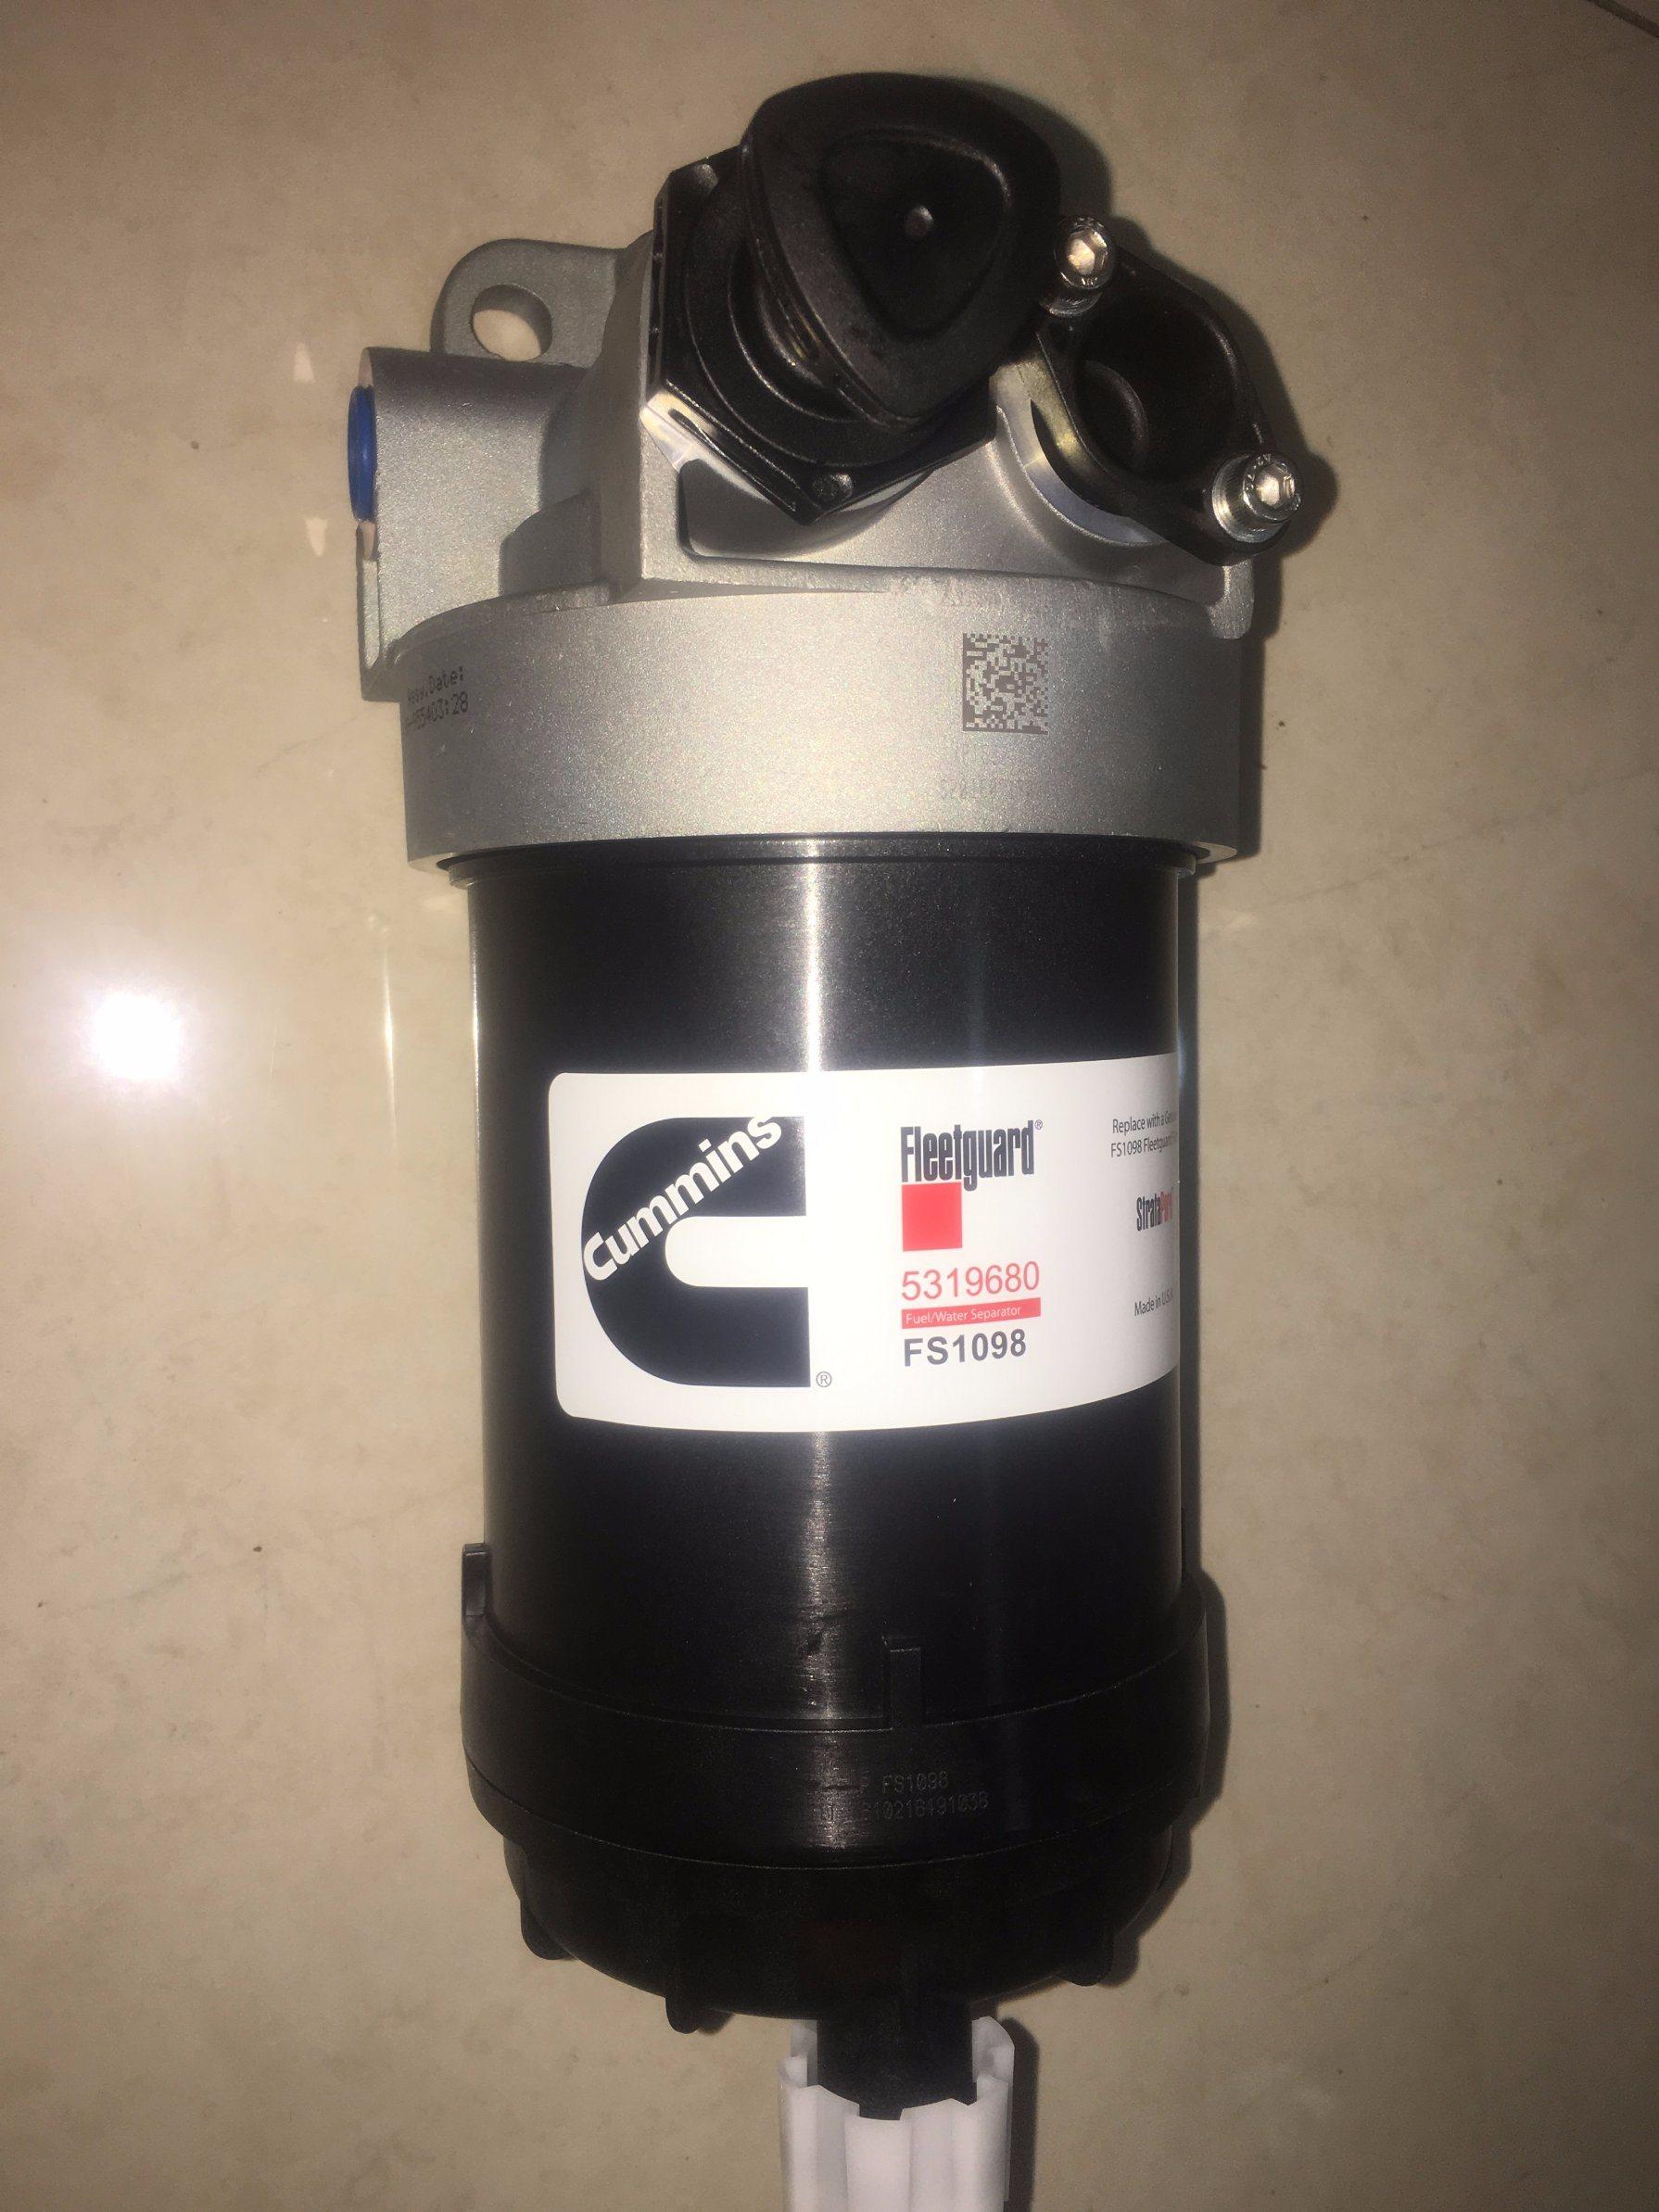 China Cummins Bracket Fuel Filter Assy 5321059 For 6b Engine Photos